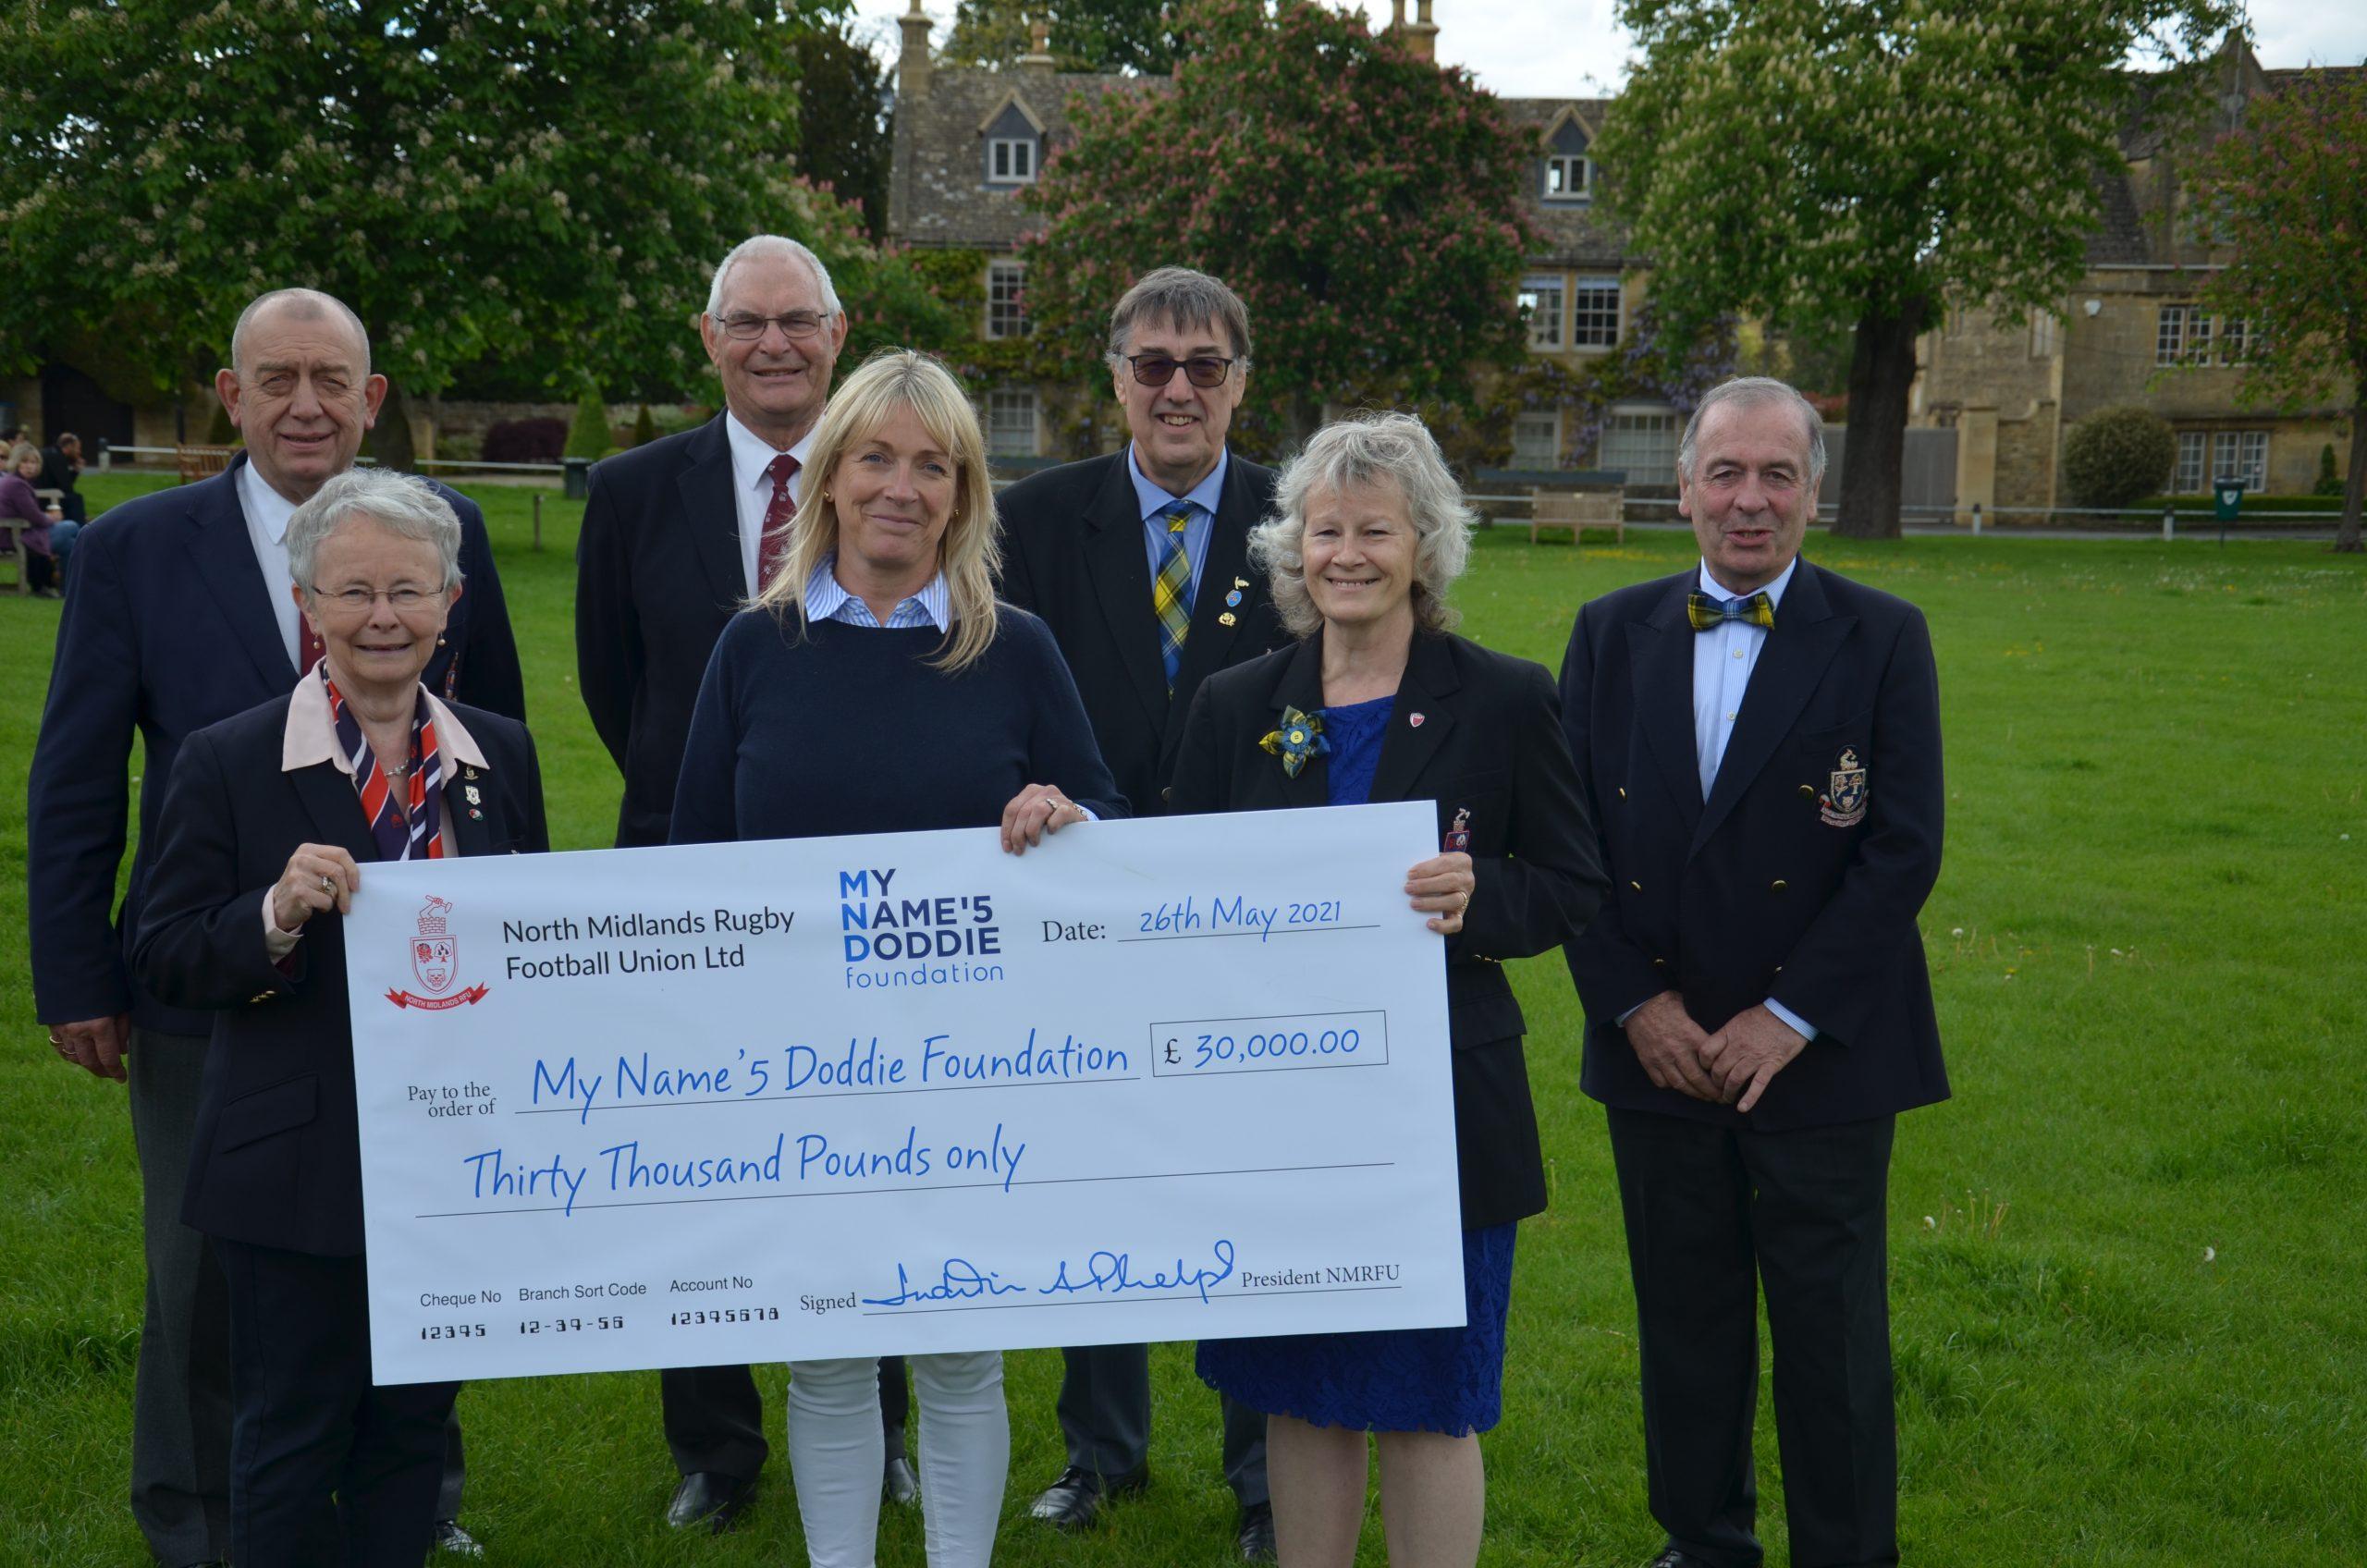 North Midlands RFU raises £30,000 for My Name'5 Doddie Foundation